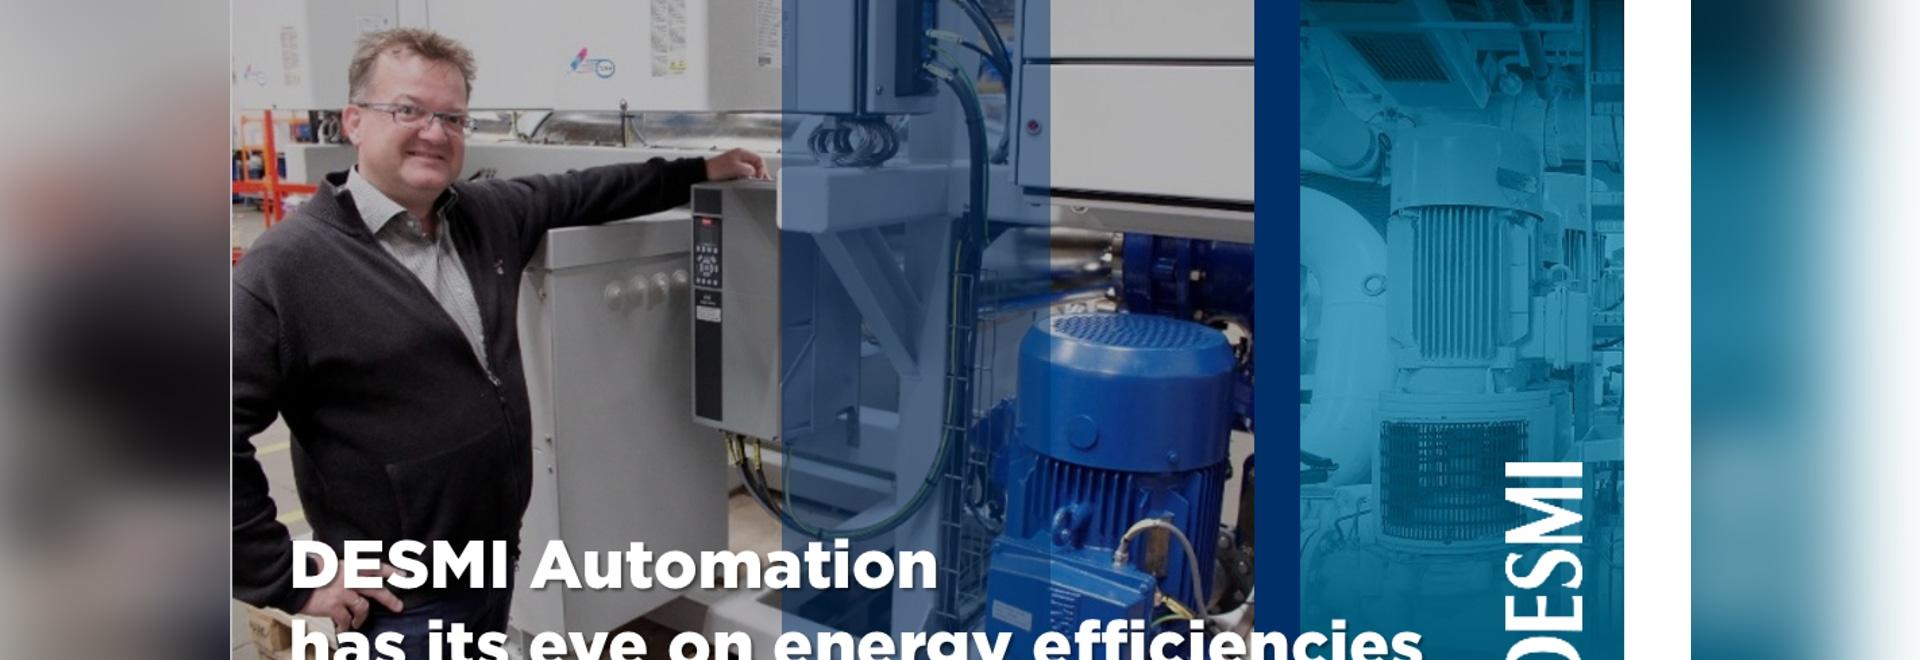 DESMI Automation has its eye on energy efficiencies